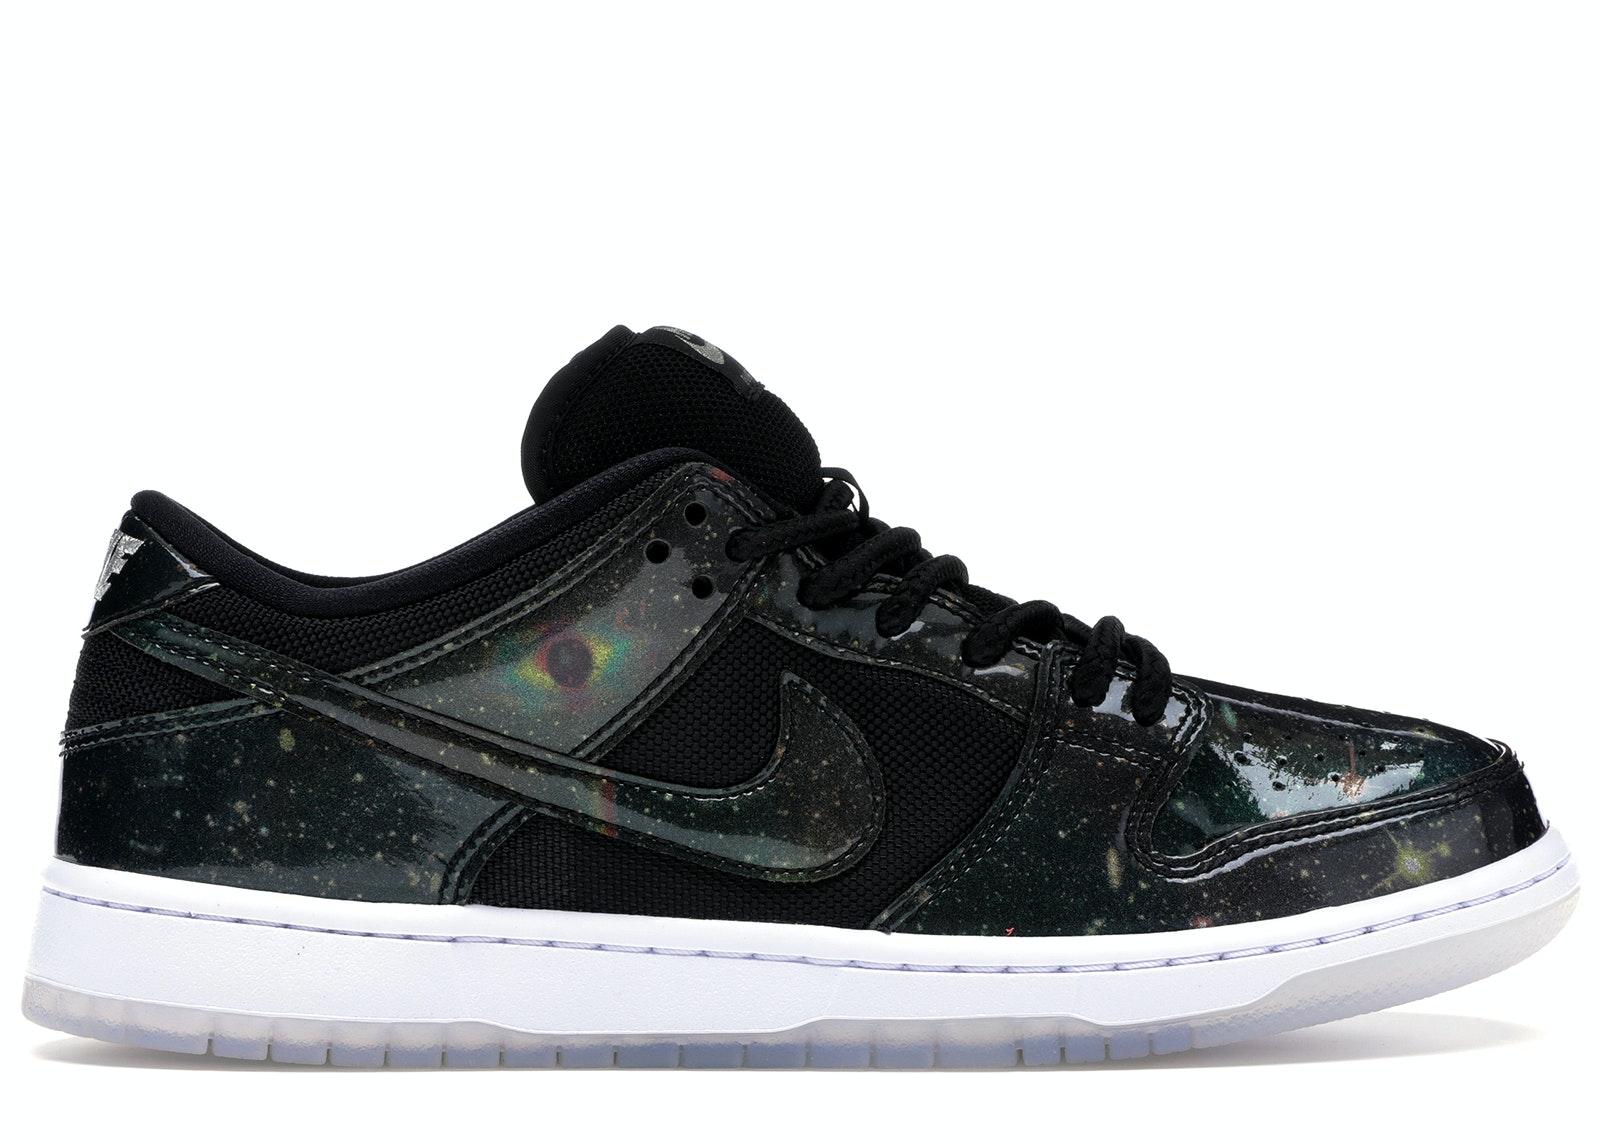 Nike SB Dunk Low 420 Intergalactic